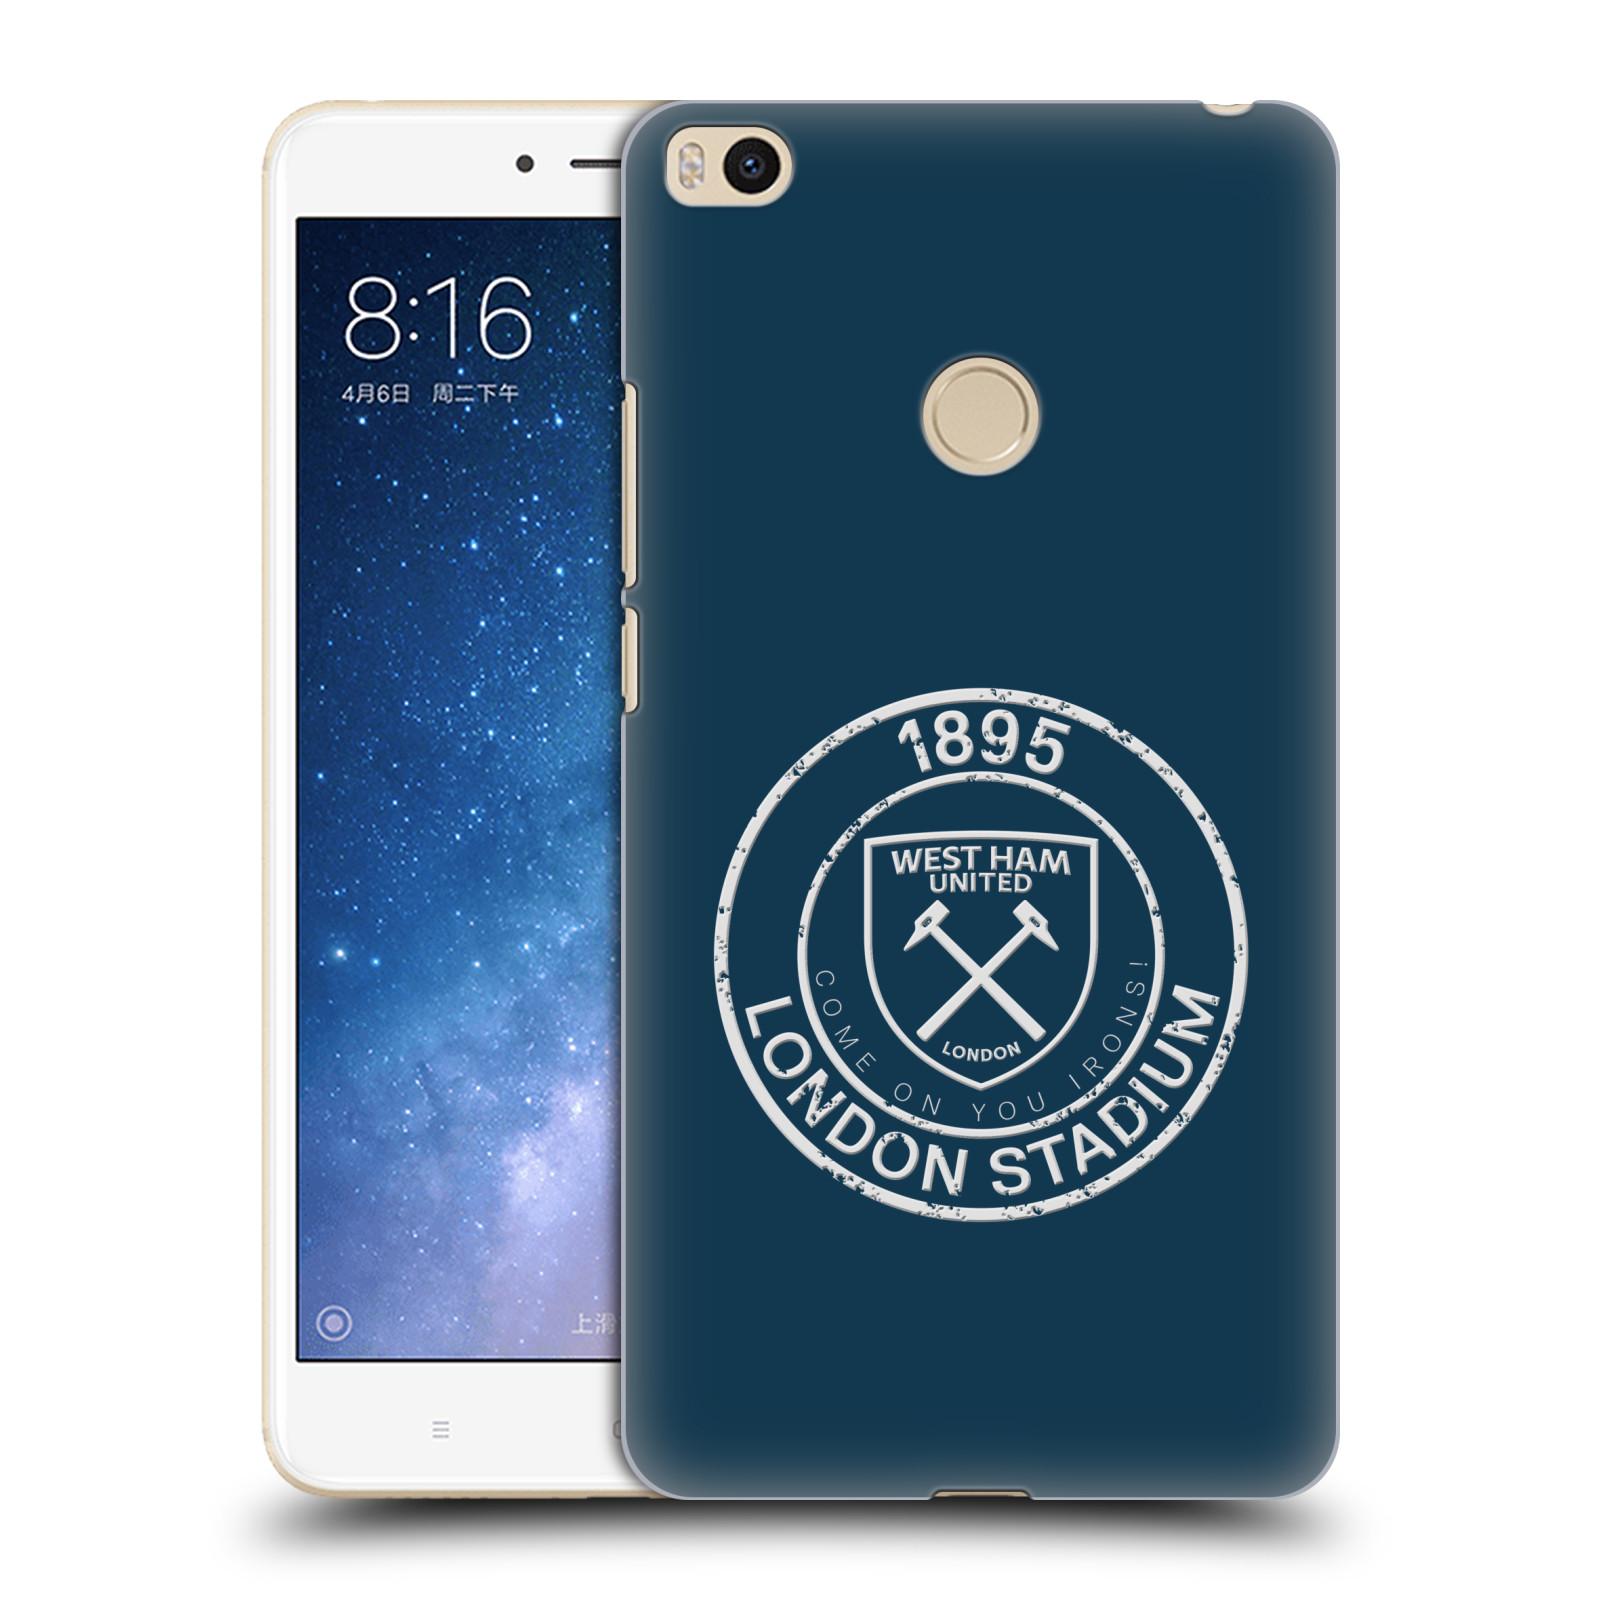 OFFICIAL-WEST-HAM-UNITED-FC-2018-19-CREST-HARD-BACK-CASE-FOR-XIAOMI-PHONES-2